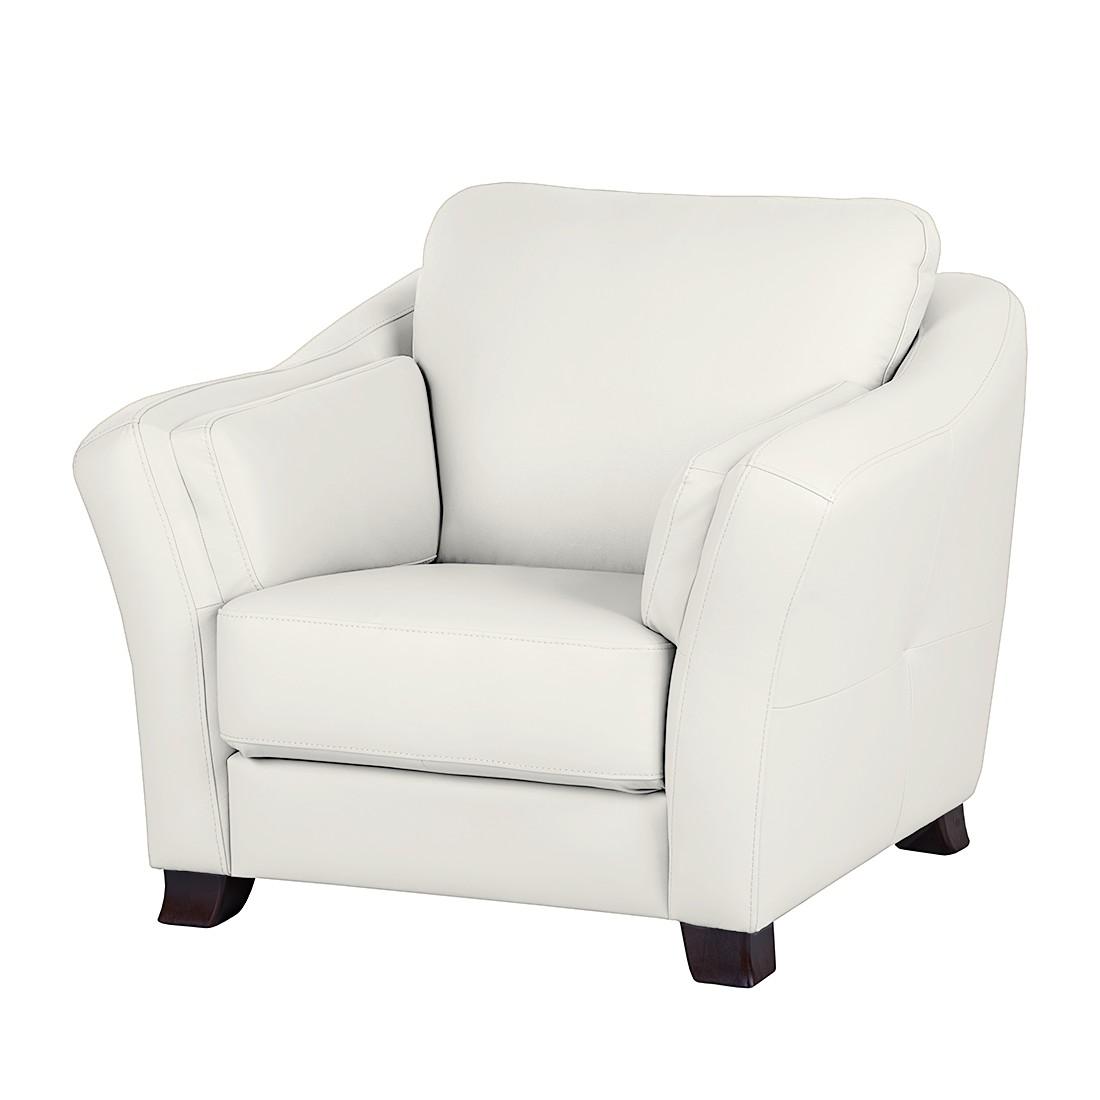 Sessel Toucy - Echtleder Weiß, Nuovoform